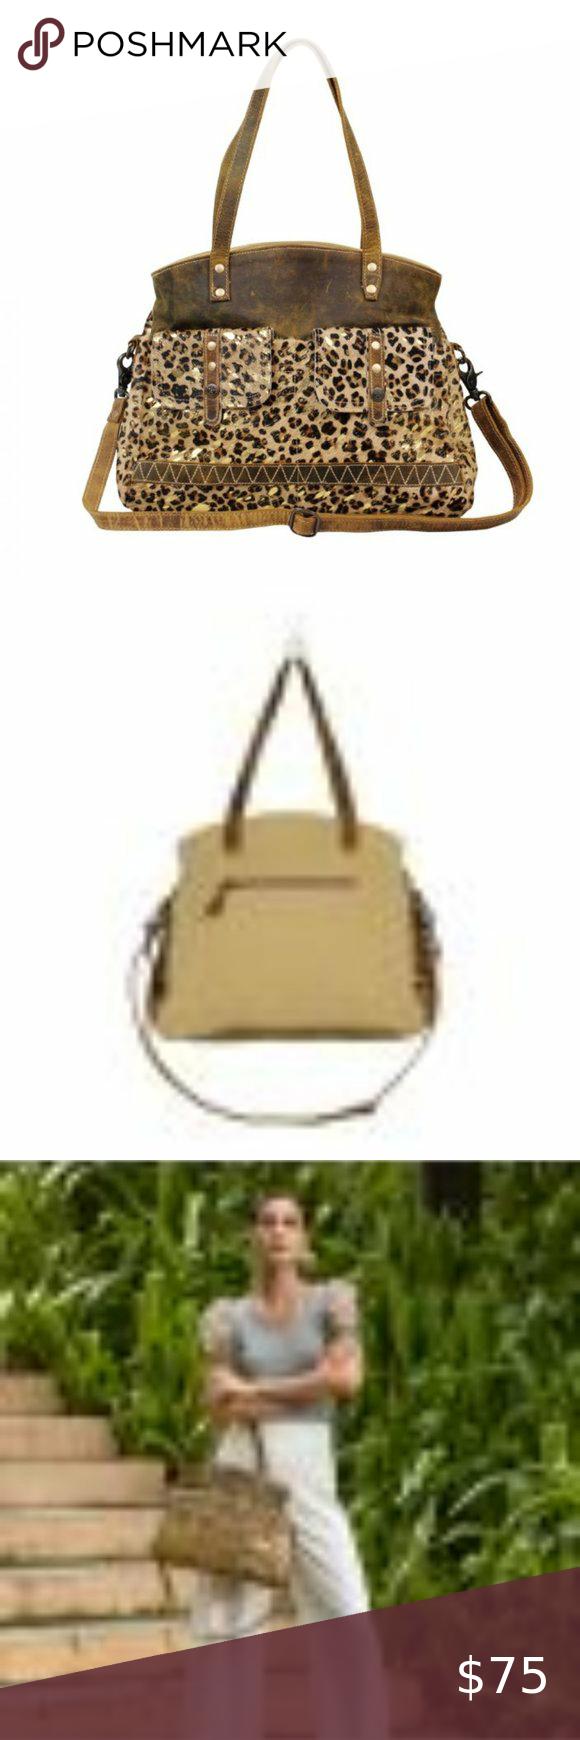 Myra Bag 252564 Nwt In 2020 Bags Shoulder Bag Leather Joblot bundle animal leopard print bags. pinterest